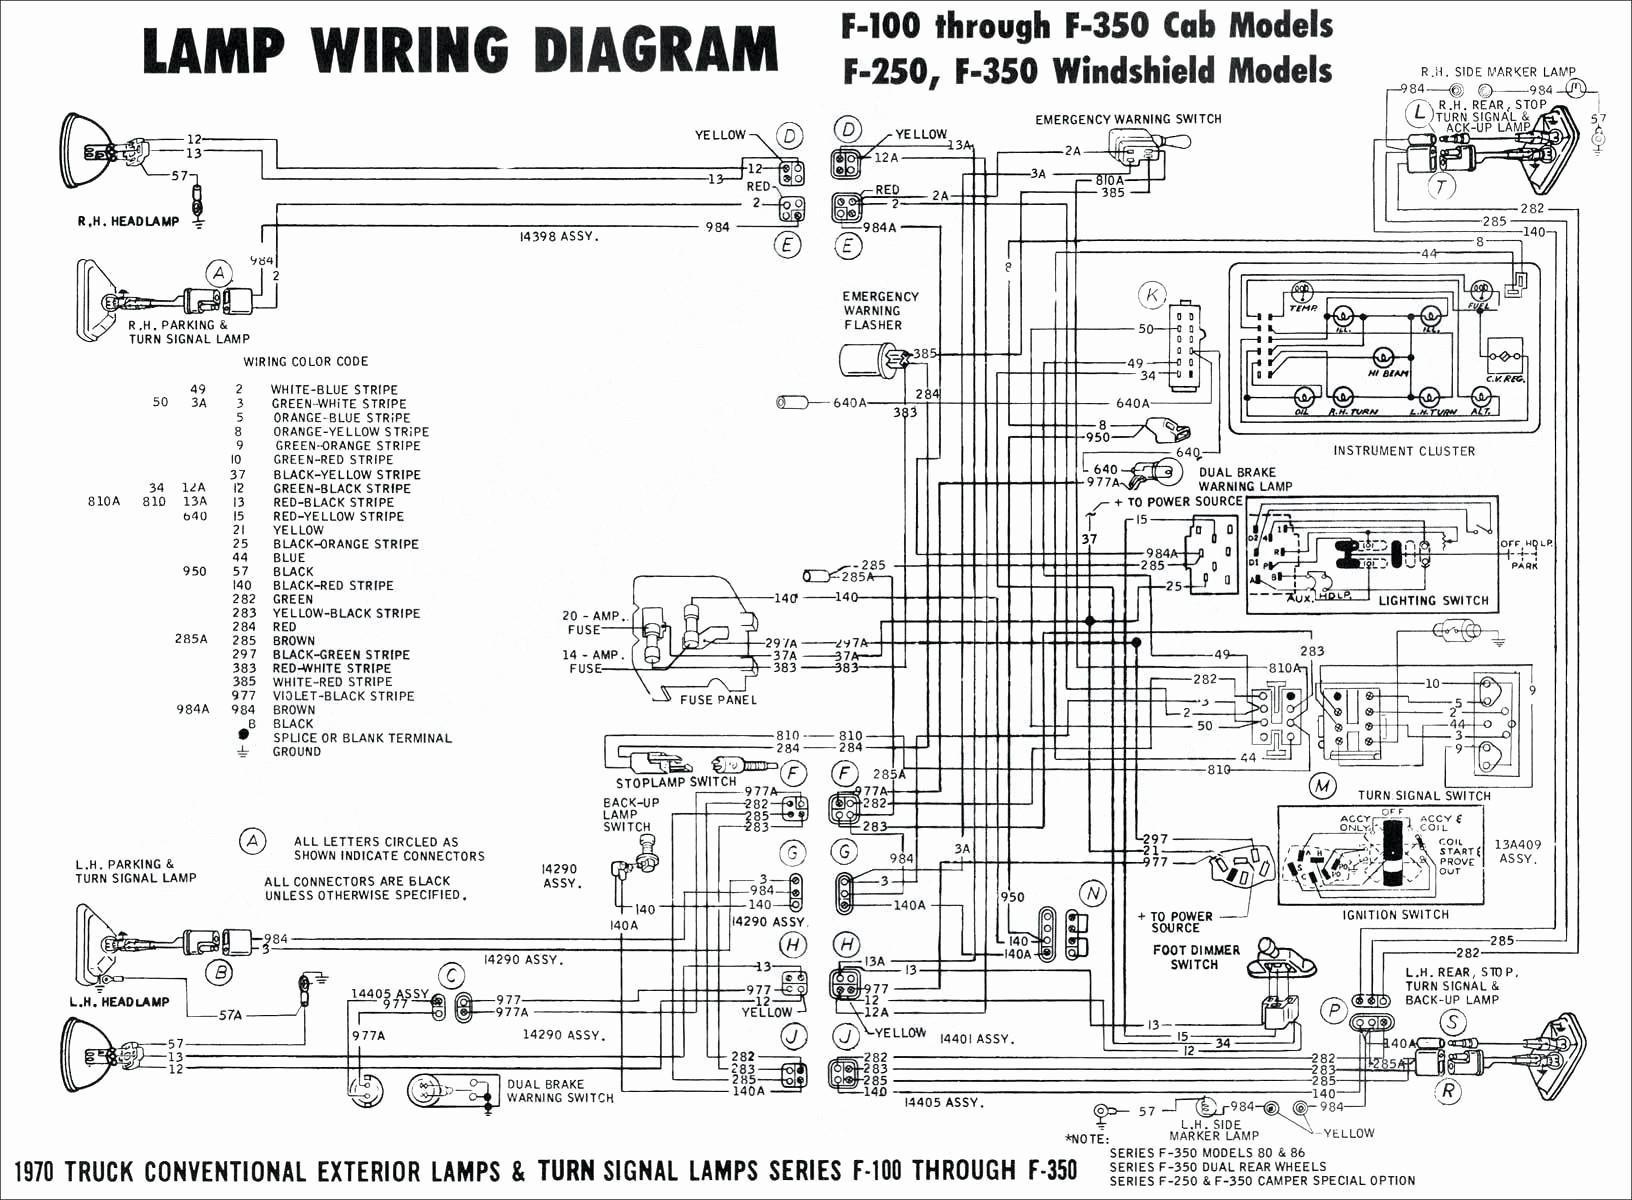 ford f650 wiring diagram ford f650 wiring diagram ford f 150 headlight wiring diagram wire center u2022 rh daniablub 7j